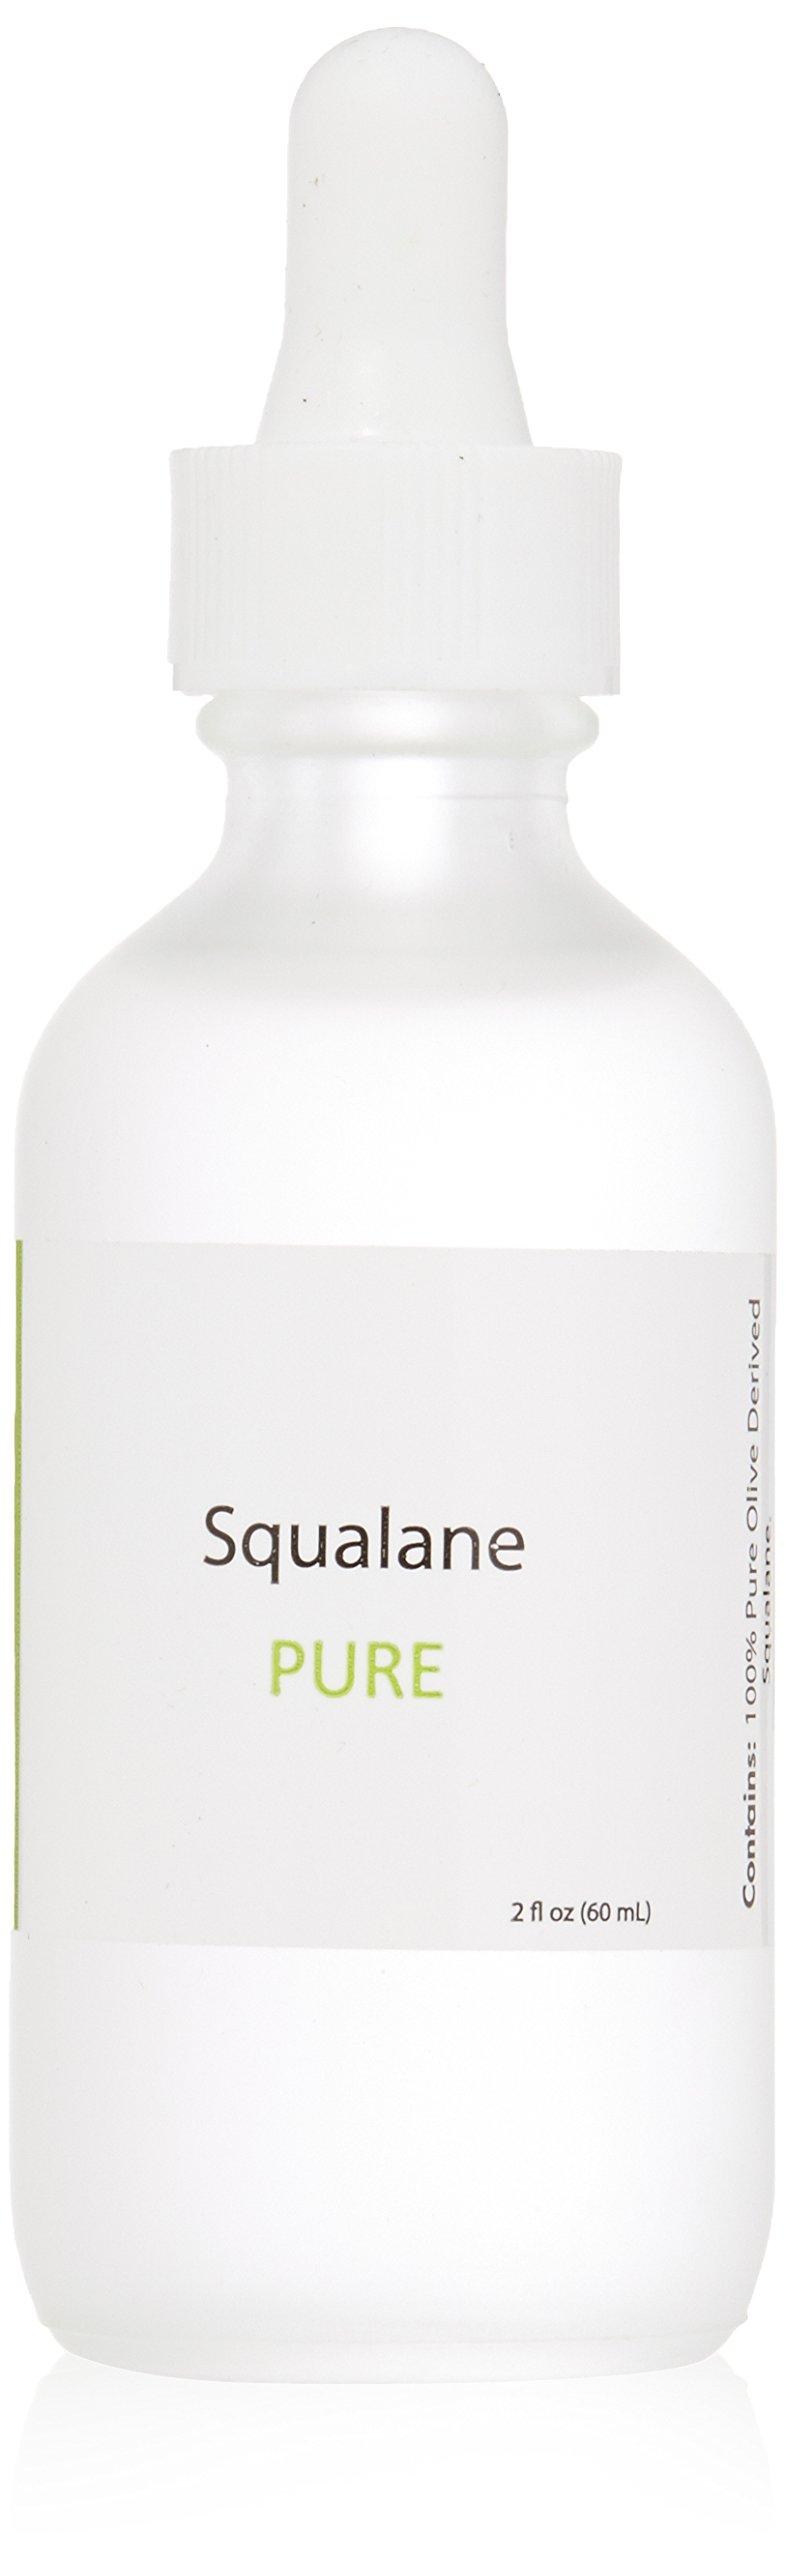 Squalane 100% Pure (2 oz (60 mL))